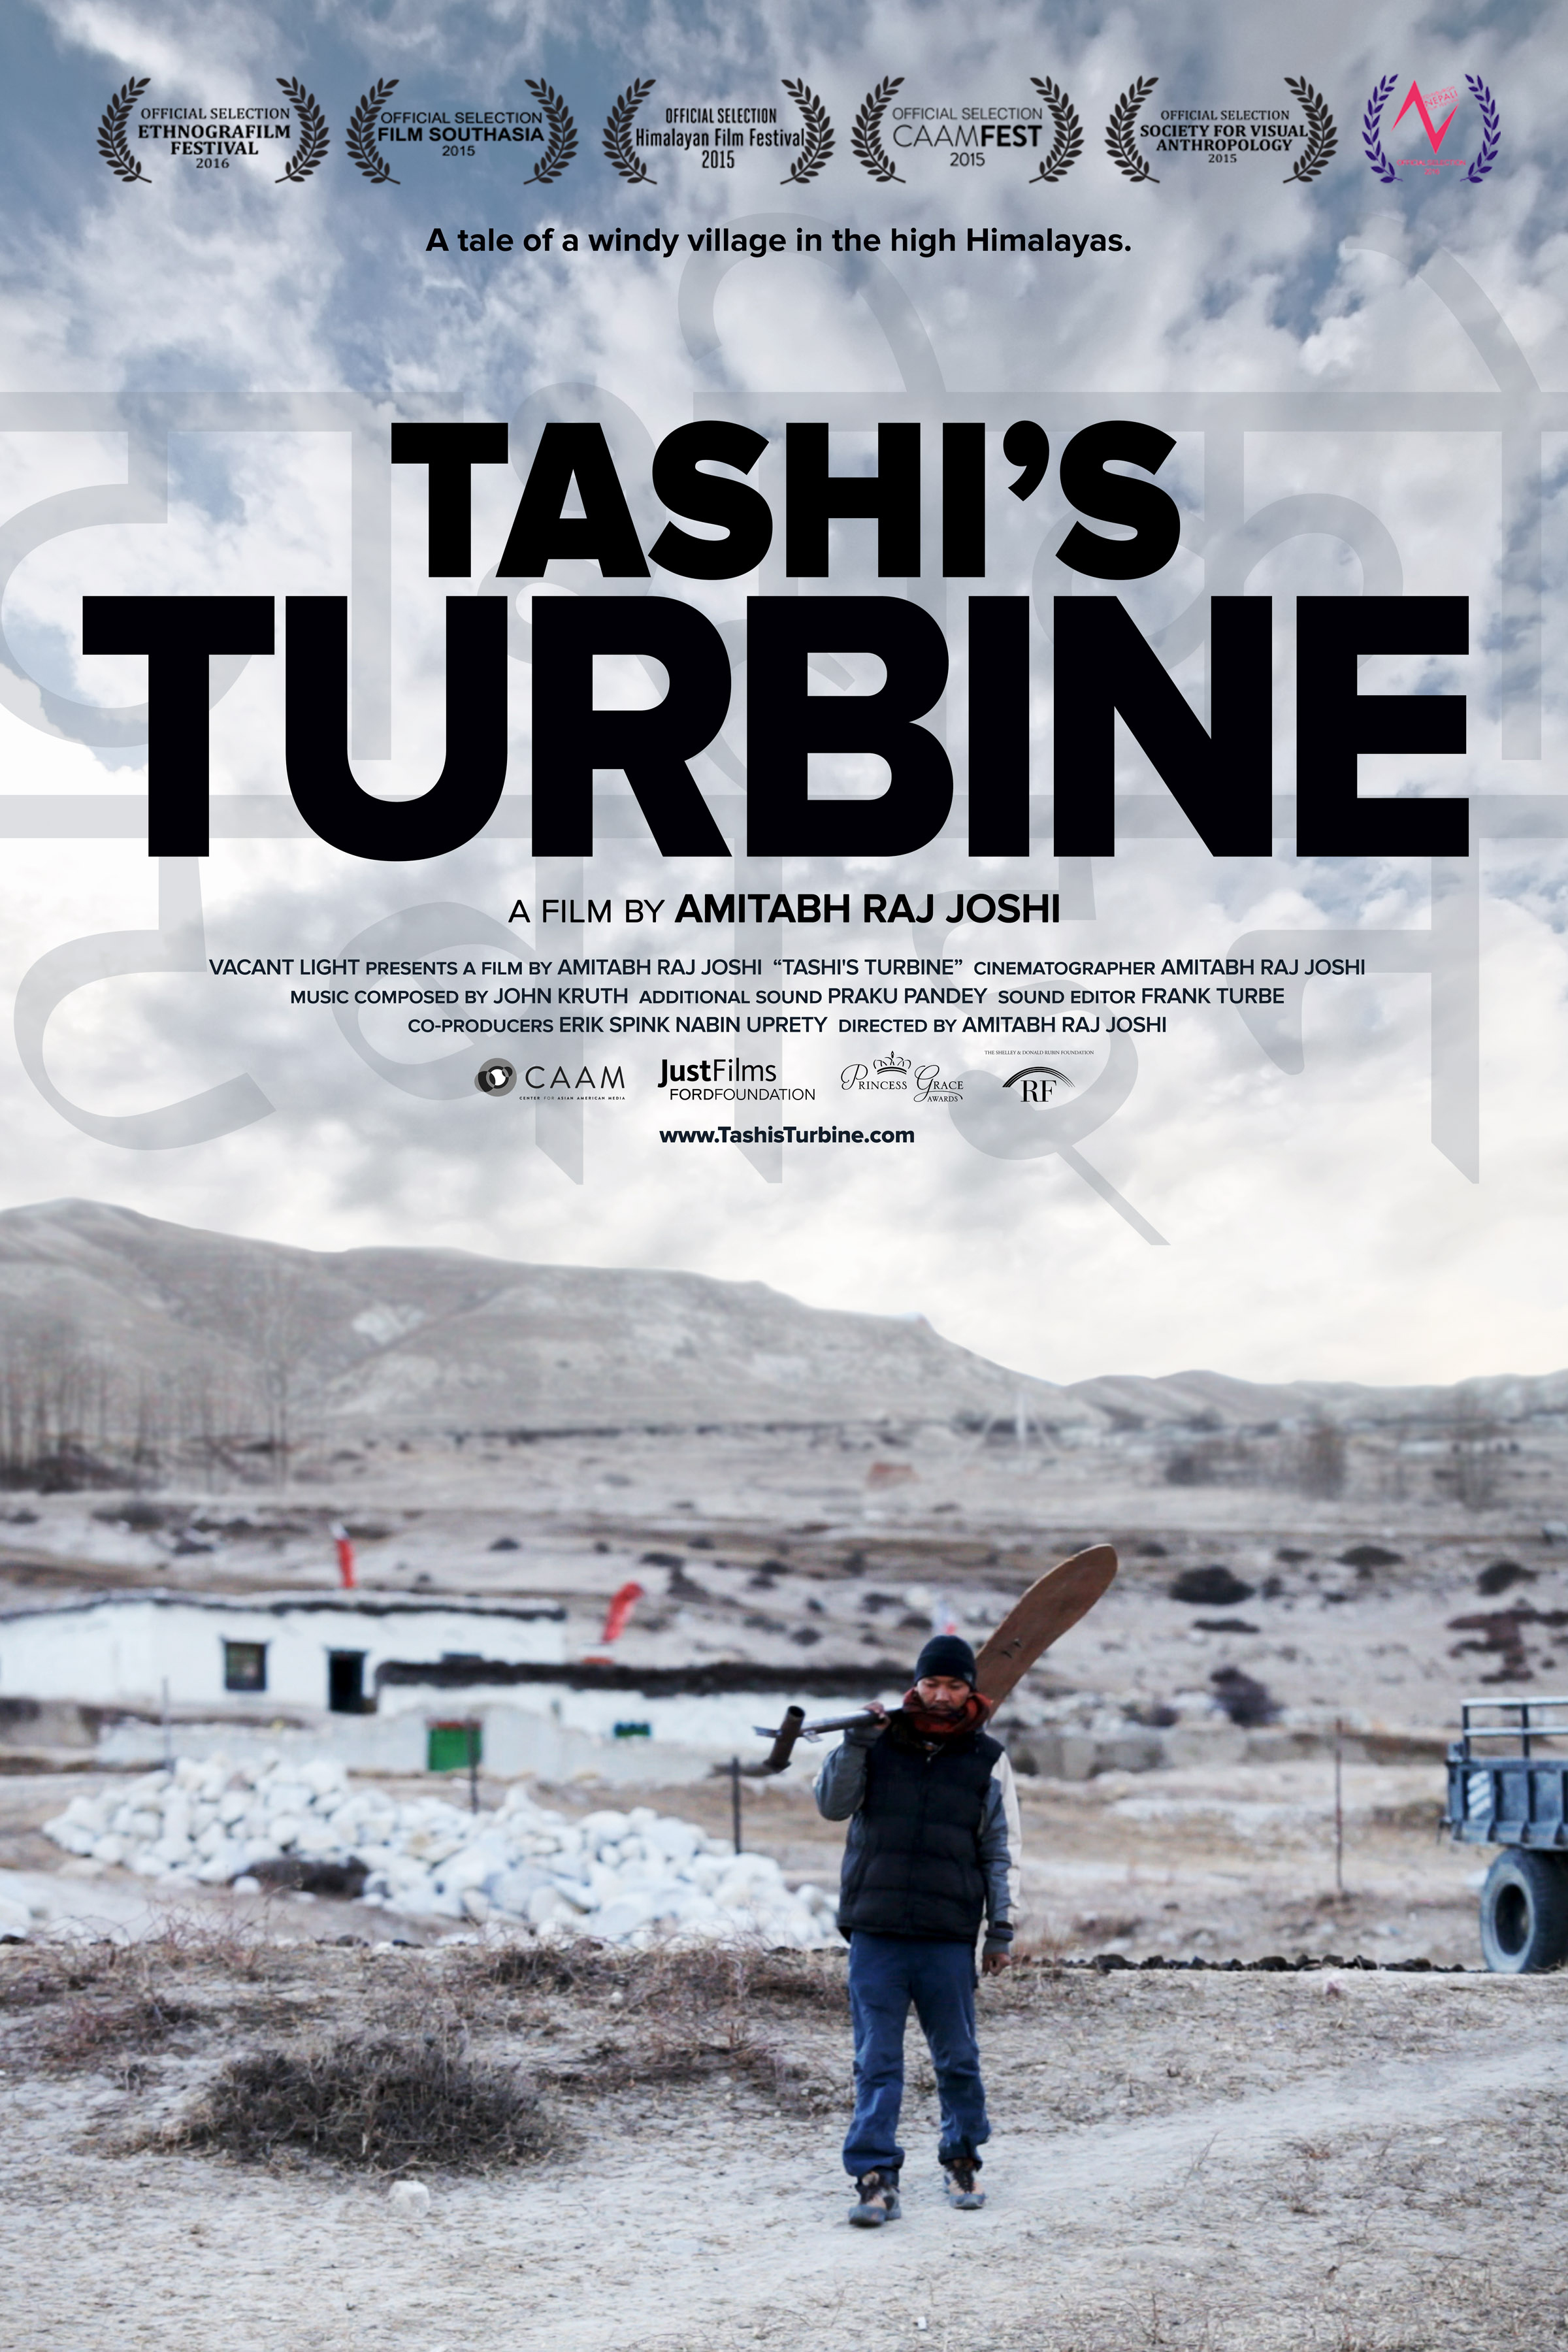 Tashi's Turbine